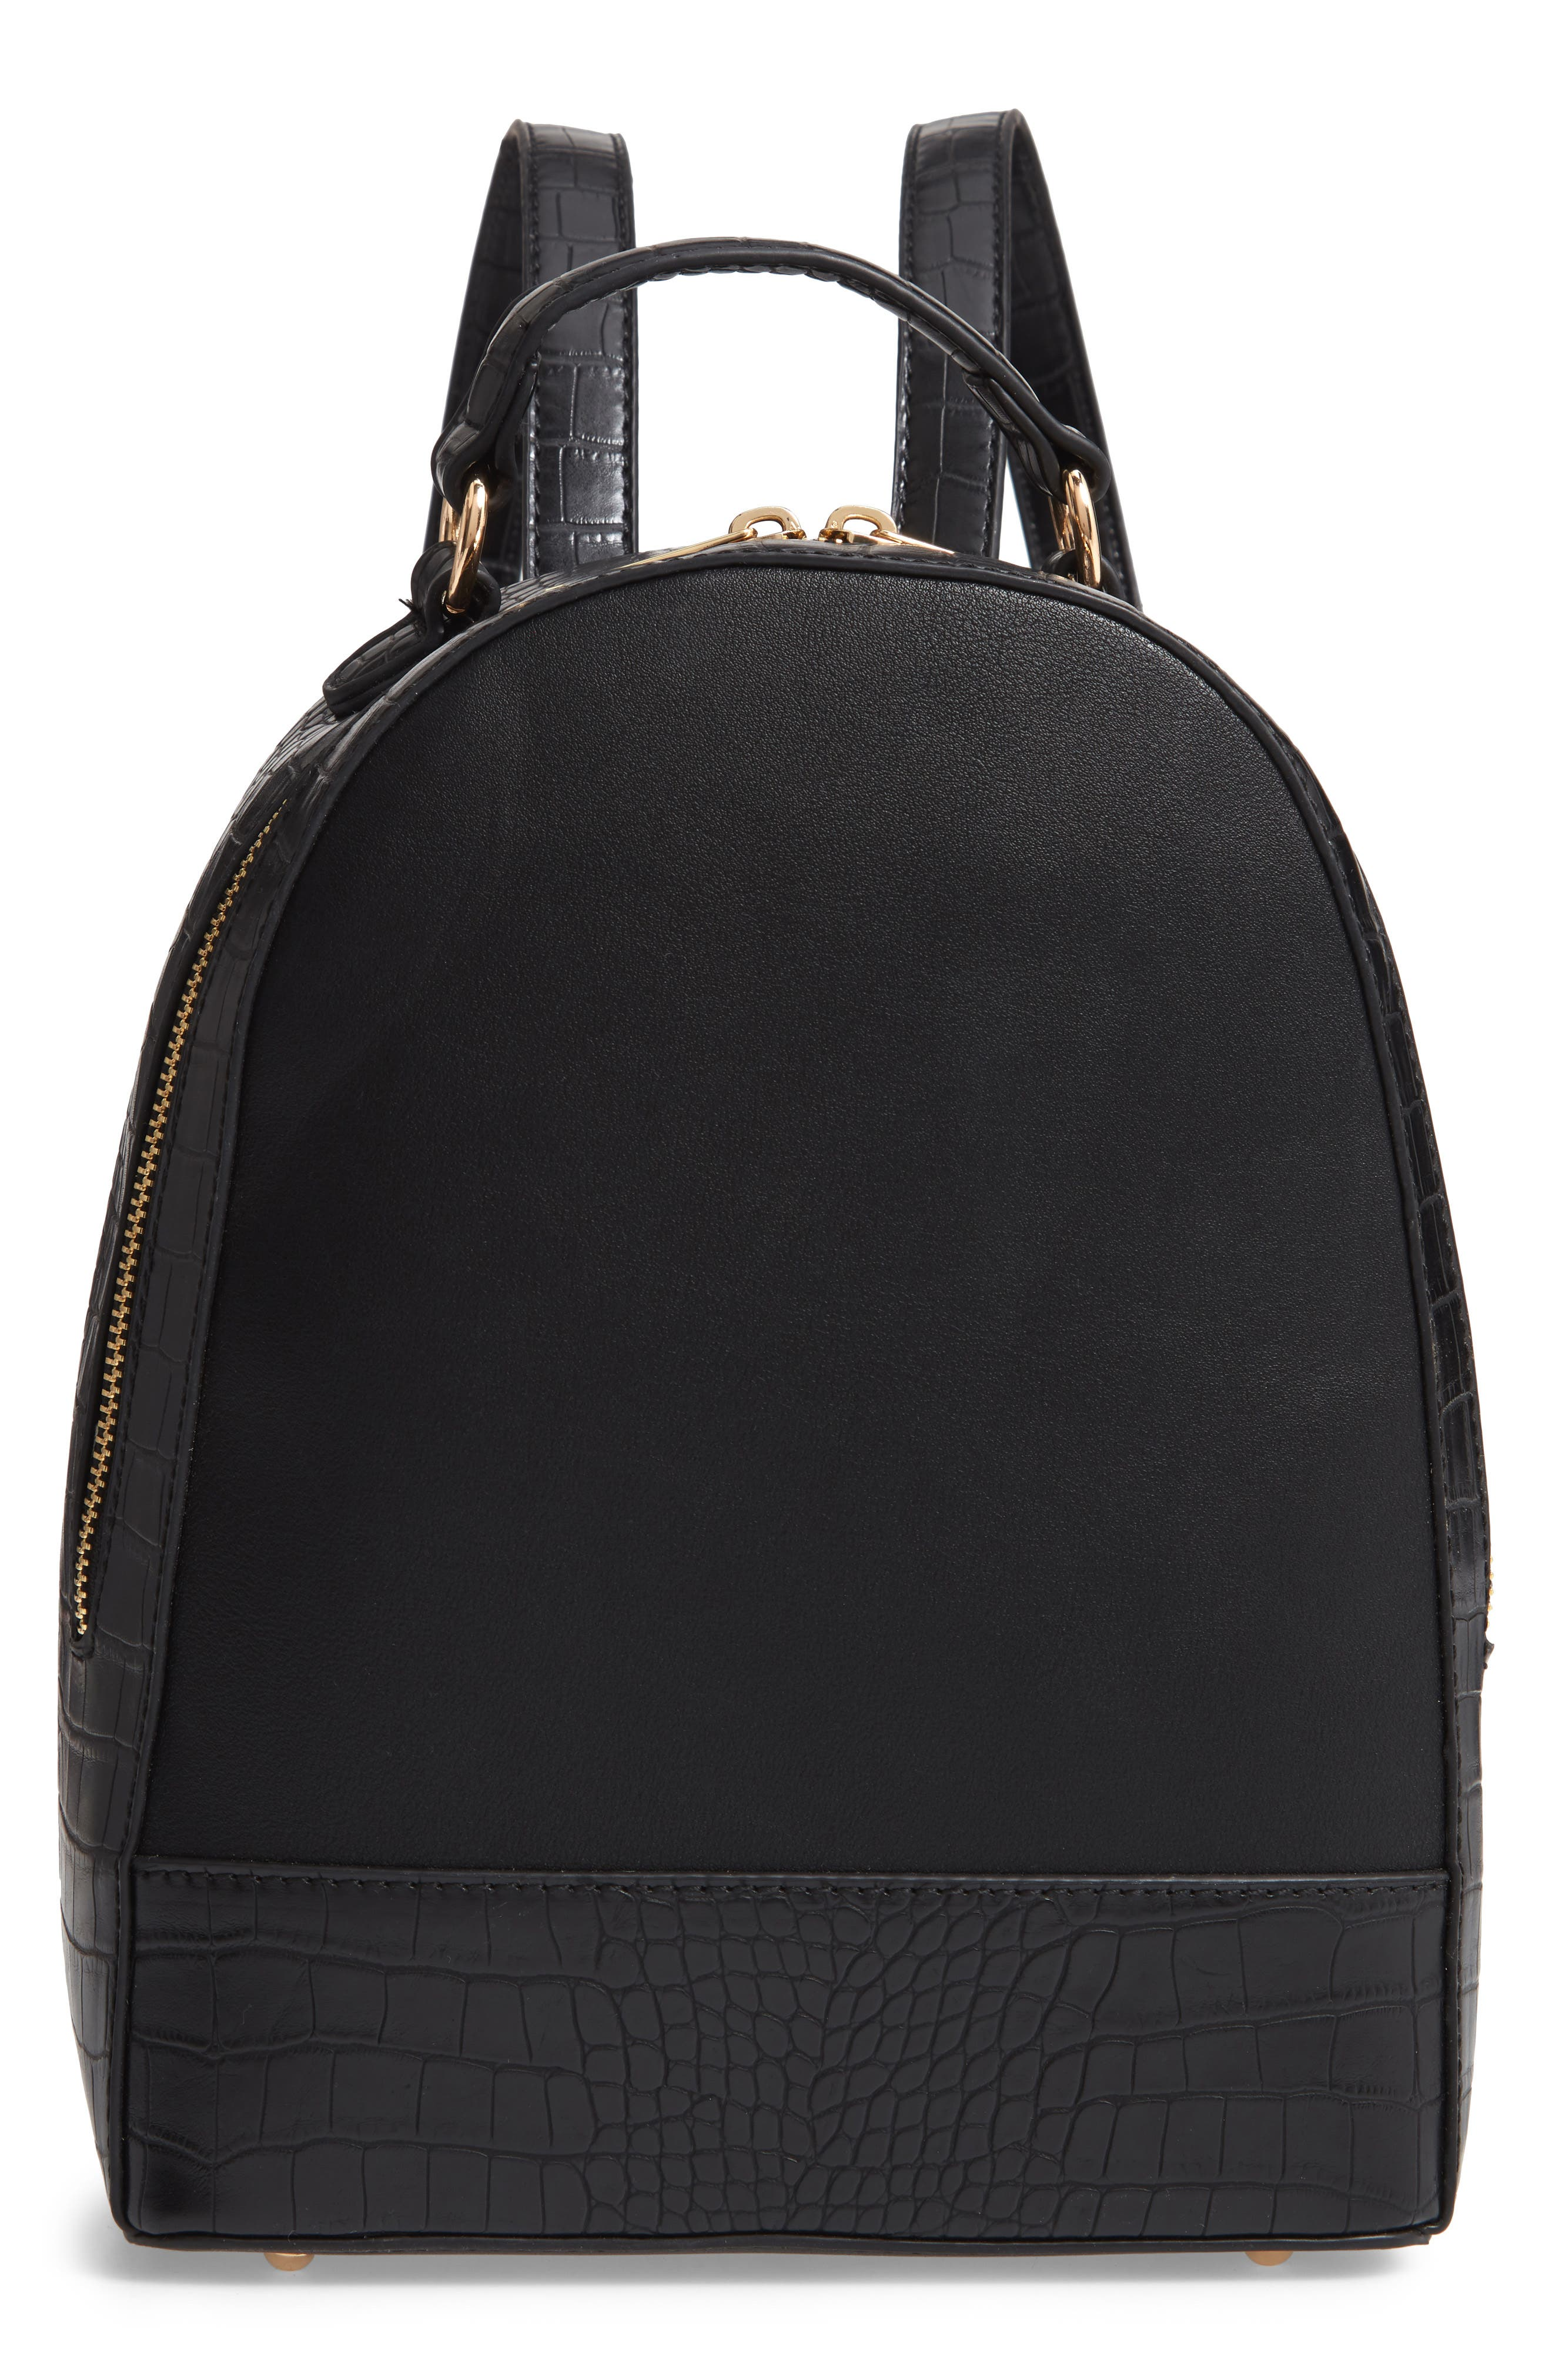 Jamya Croc Embossed Faux Leather Backpack,                             Main thumbnail 1, color,                             BLACK